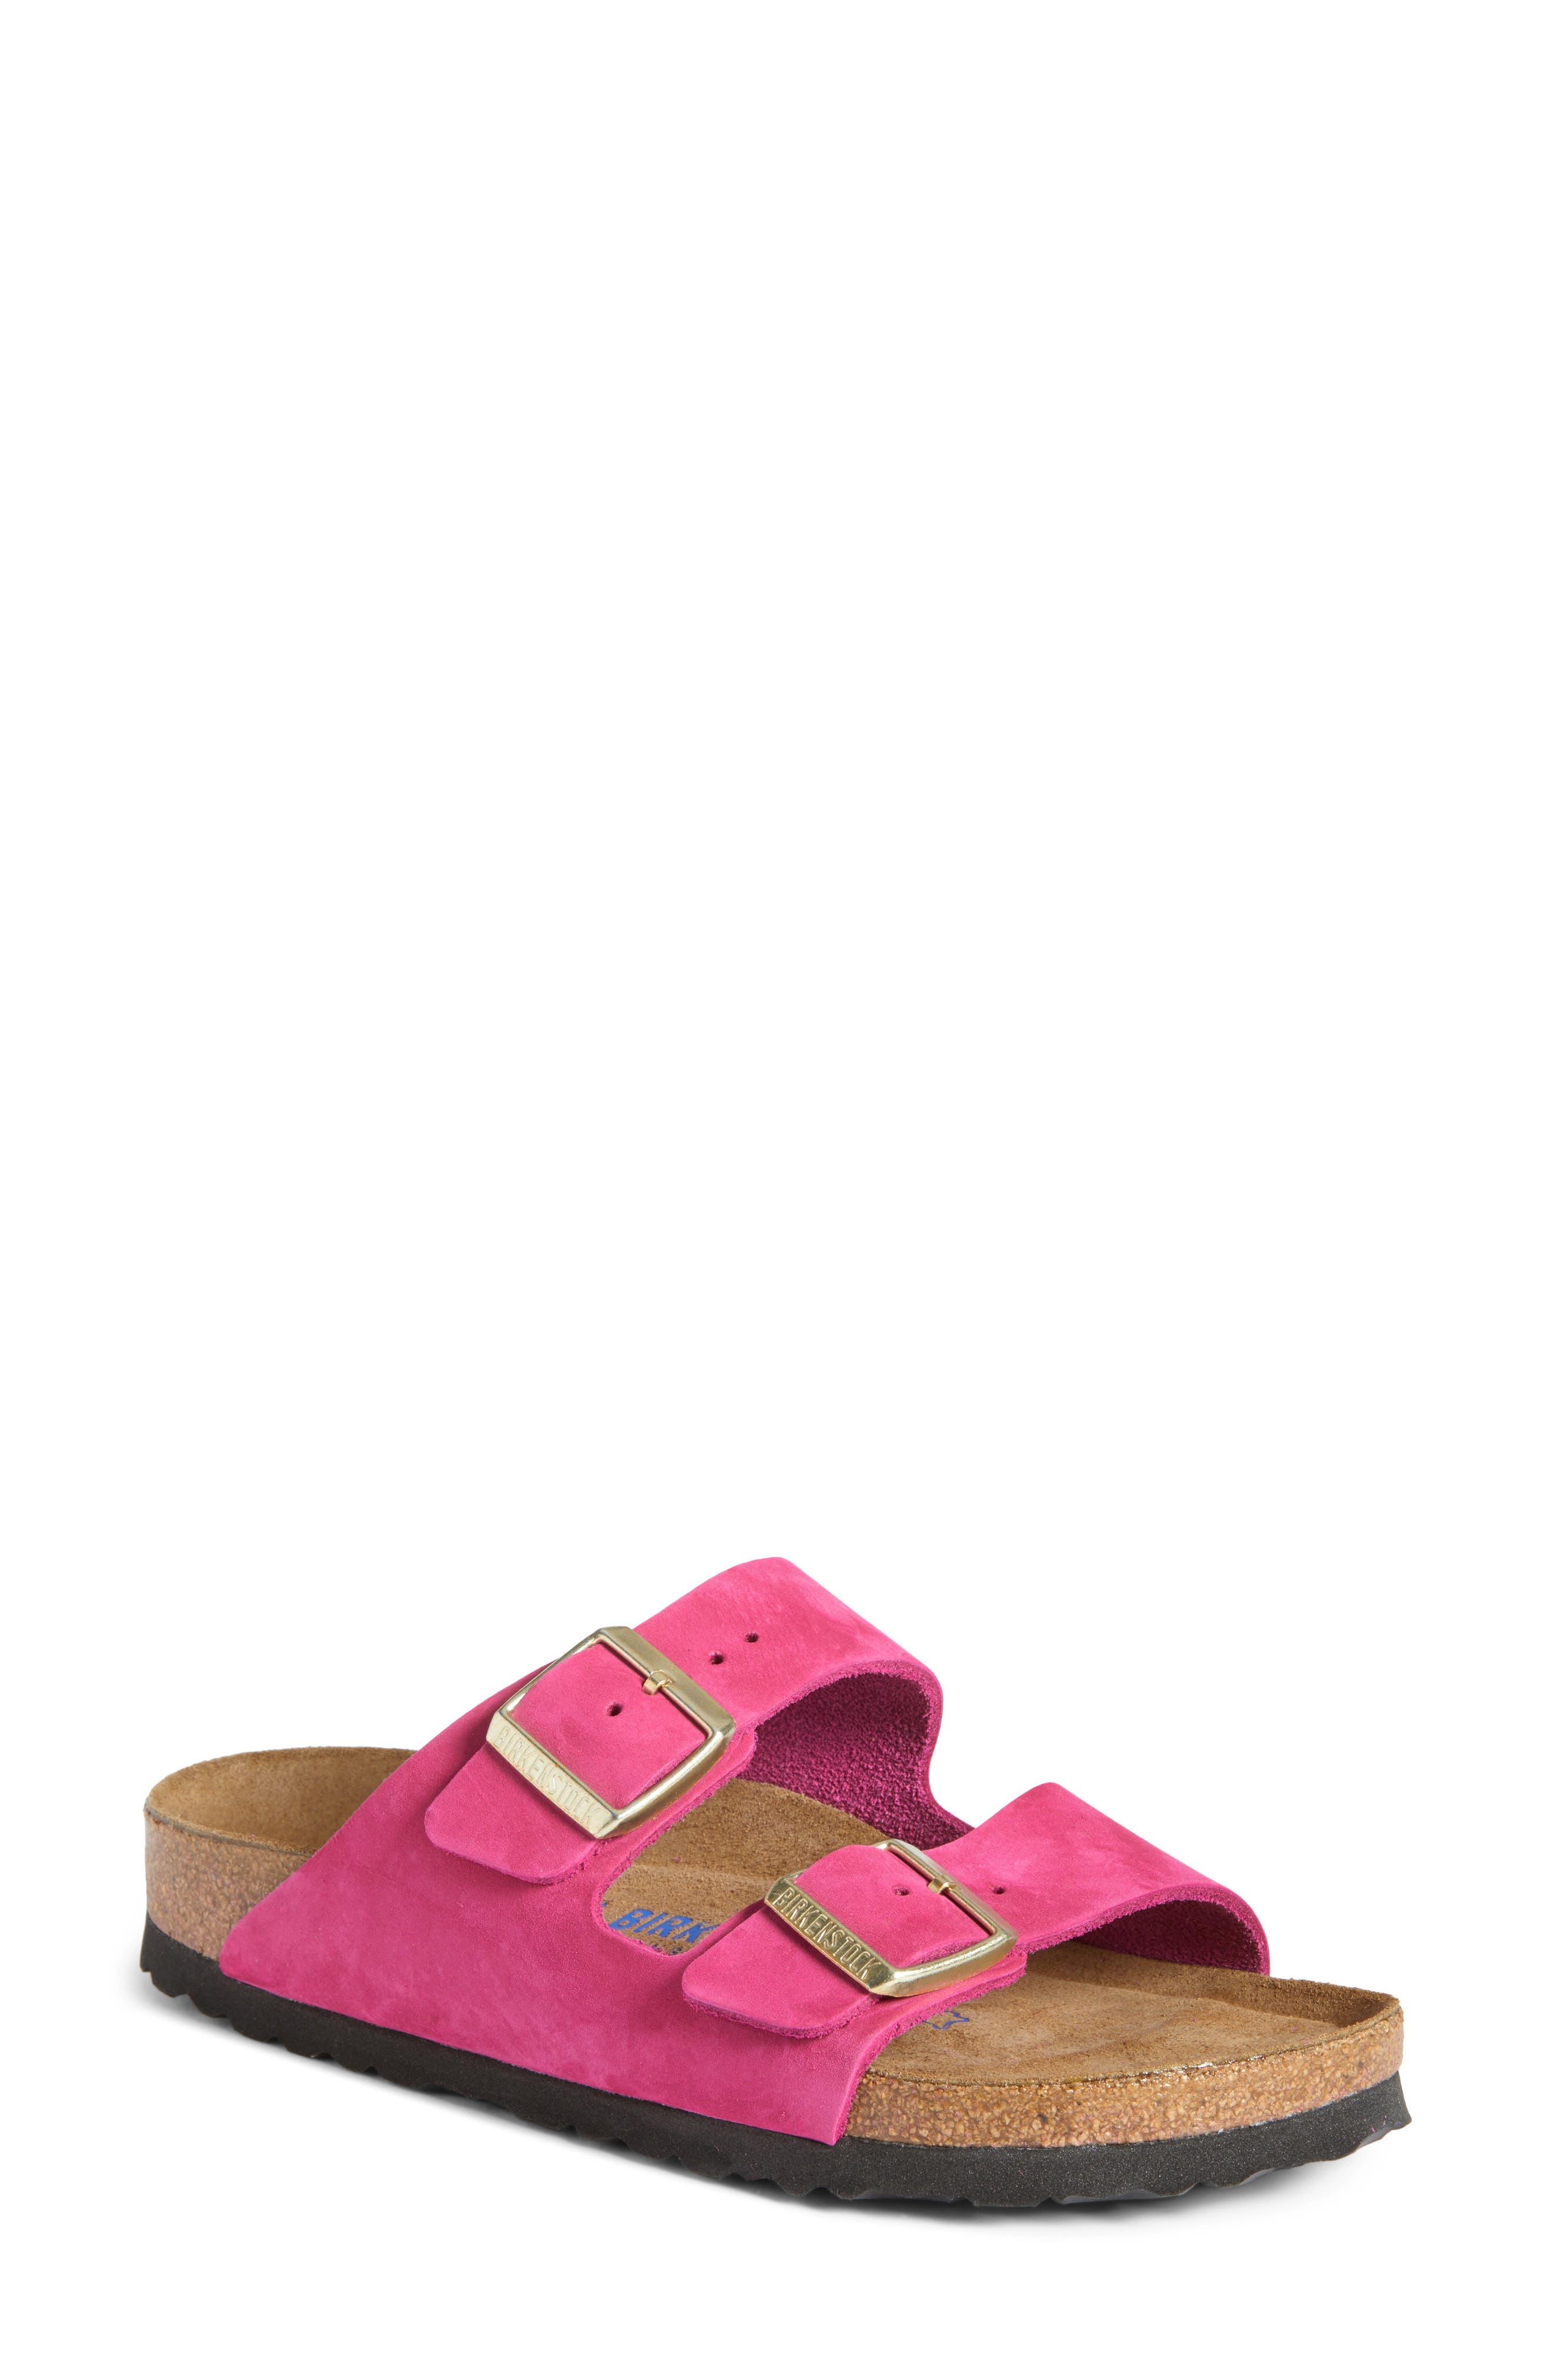 New Style Women Bionica Coast Purple Free Shipping BOTH Ways Heels r5jbtcx O